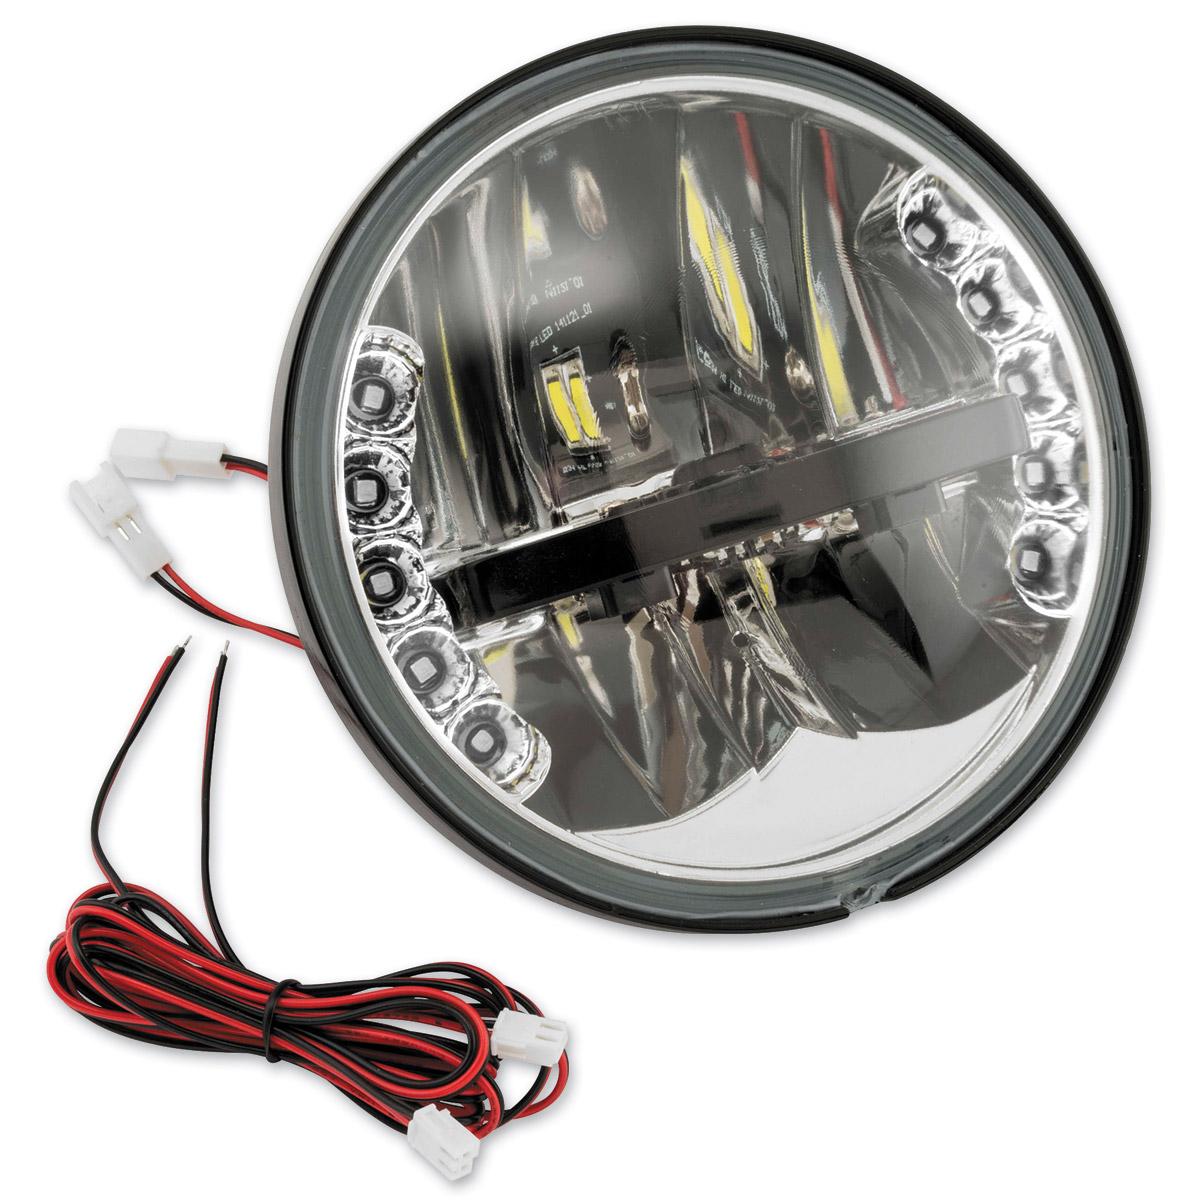 BikeMaster 5-3/4″ LED Headlight with Amber Turn Signals